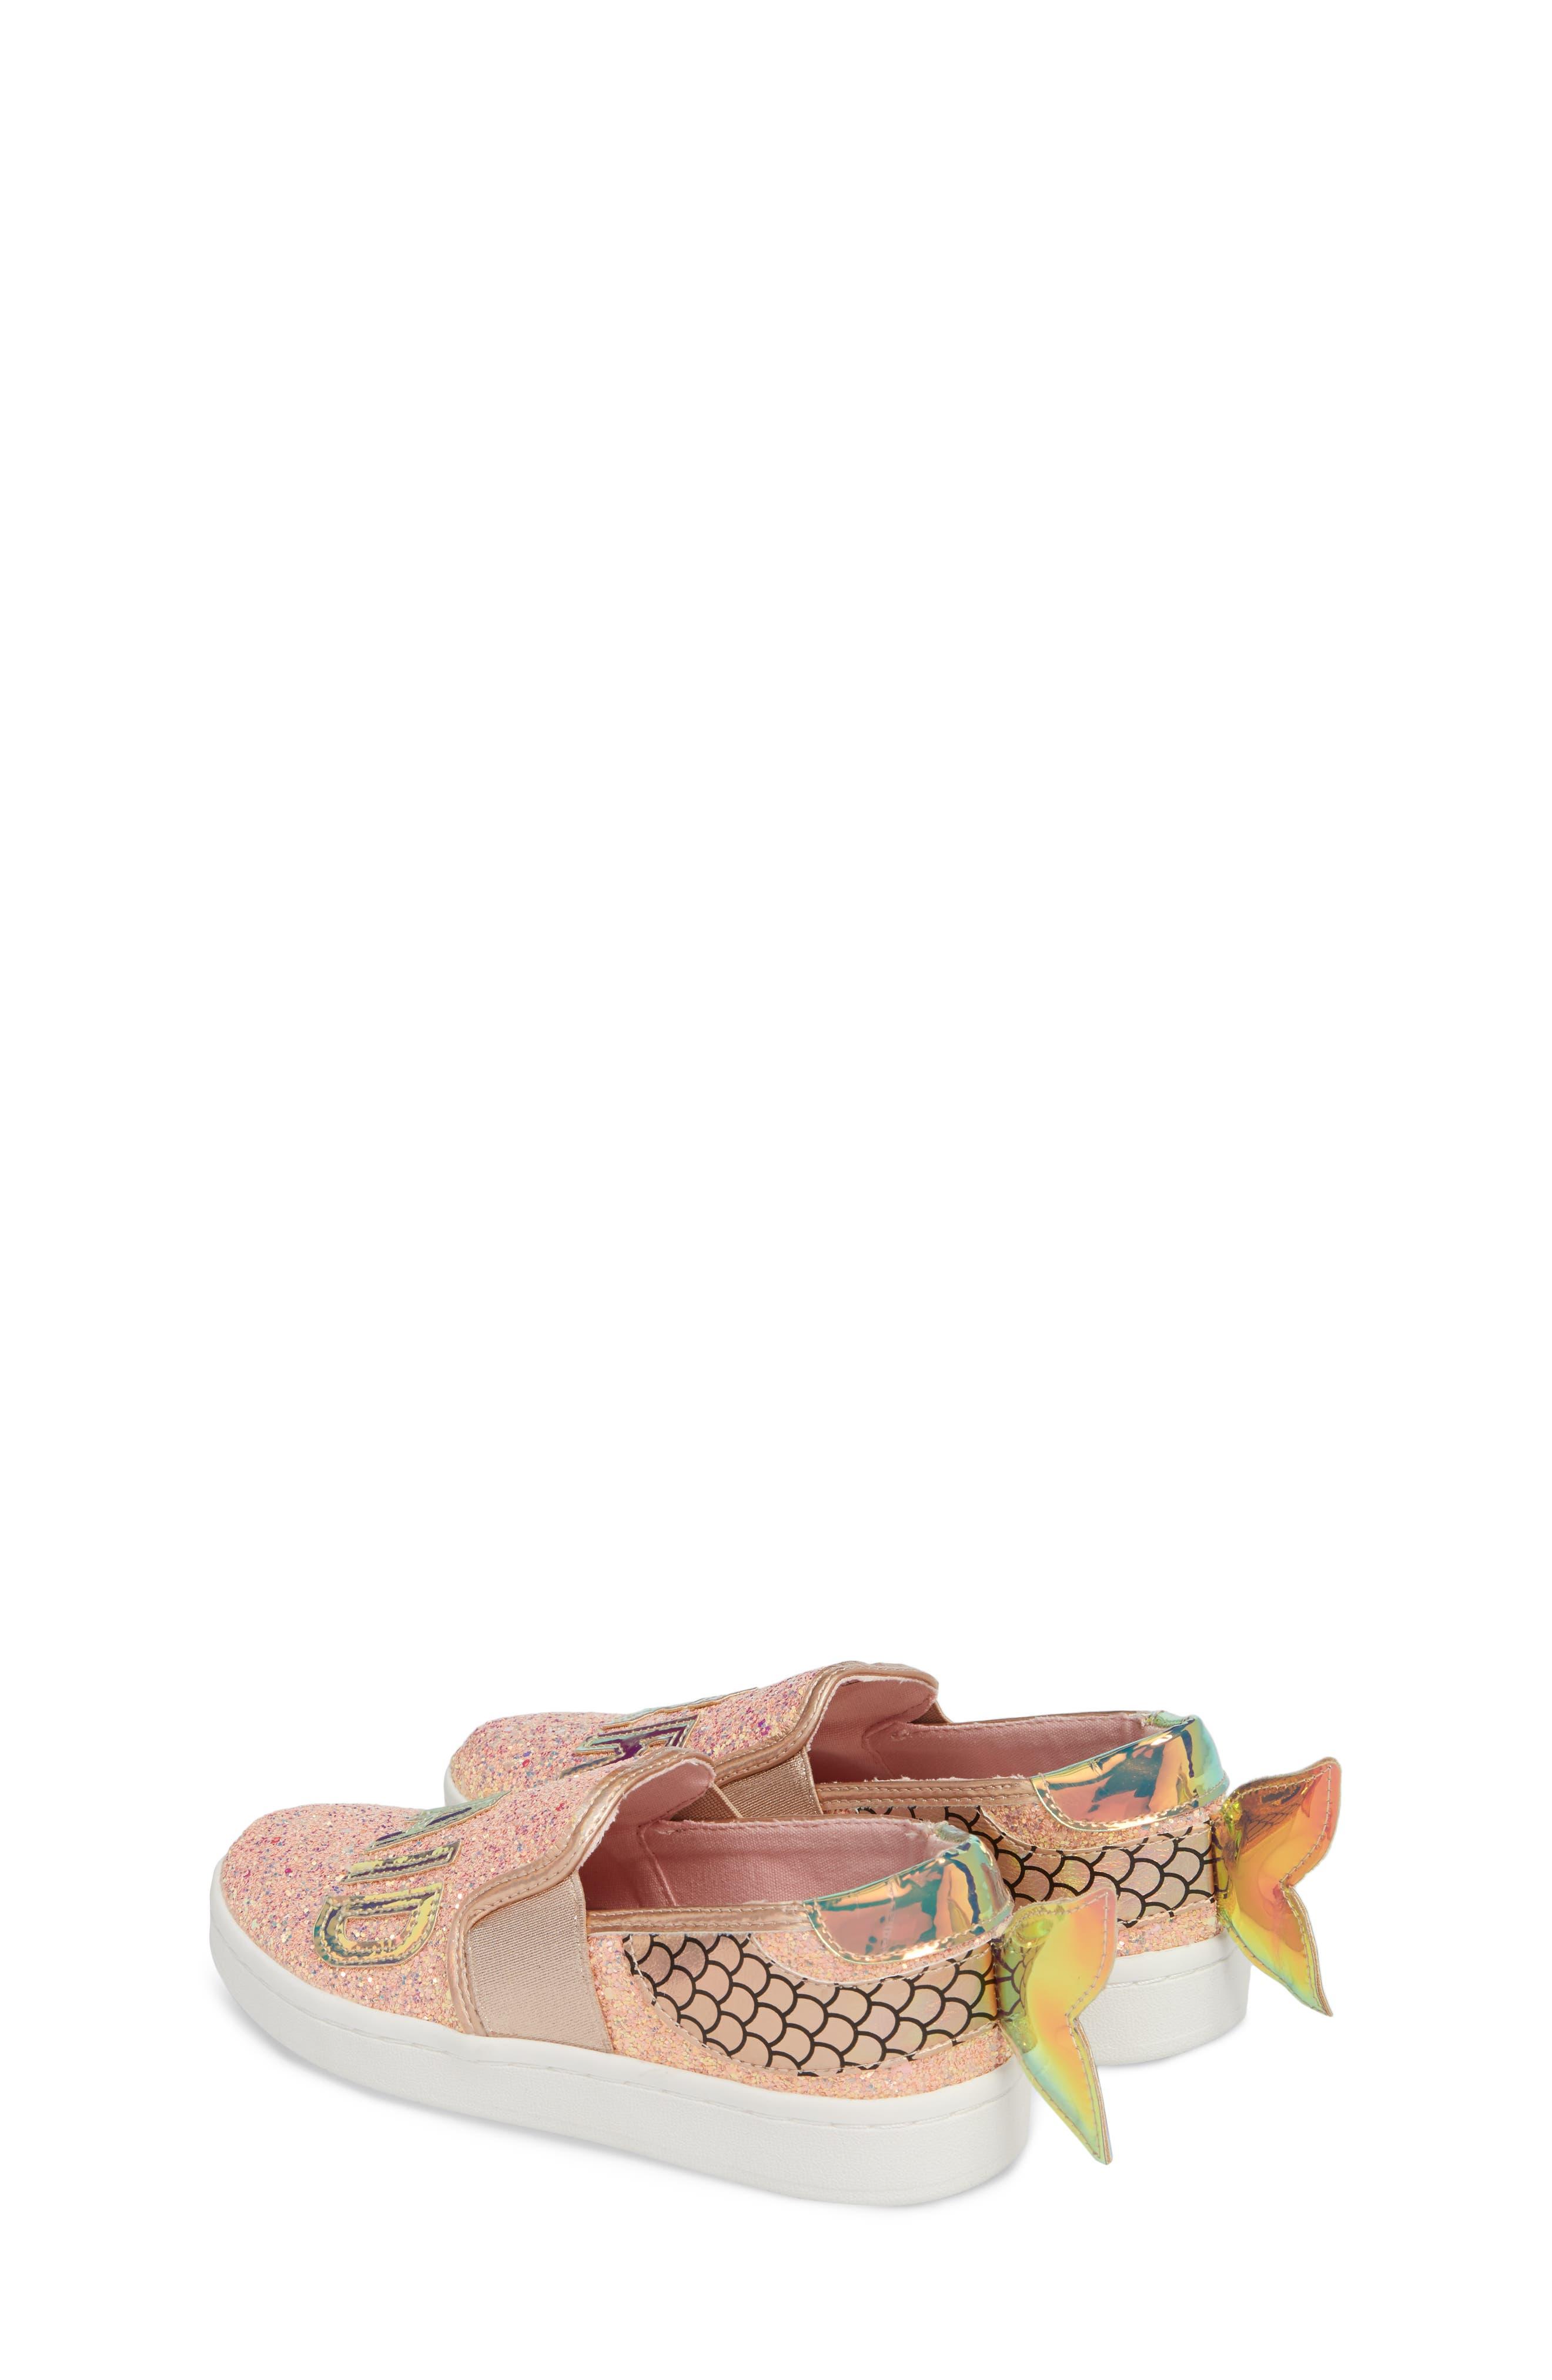 Blane Mermaid Sneaker,                             Alternate thumbnail 3, color,                             220